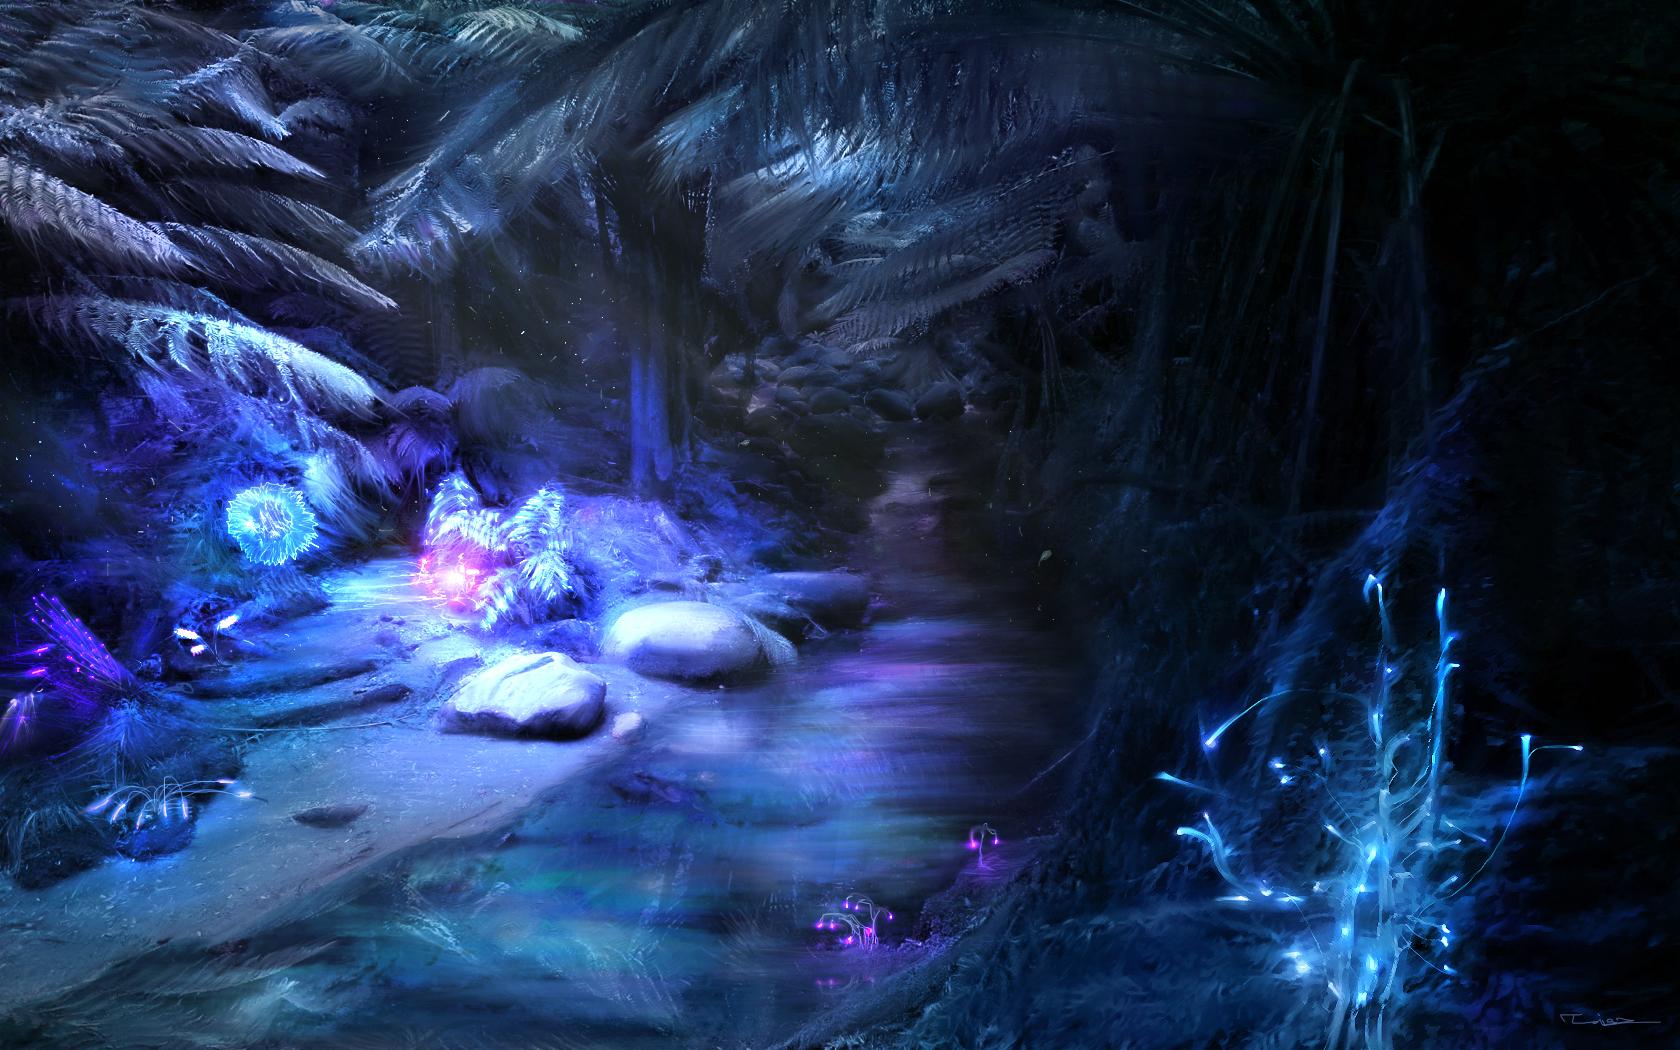 silent night by tiazgriff on deviantart